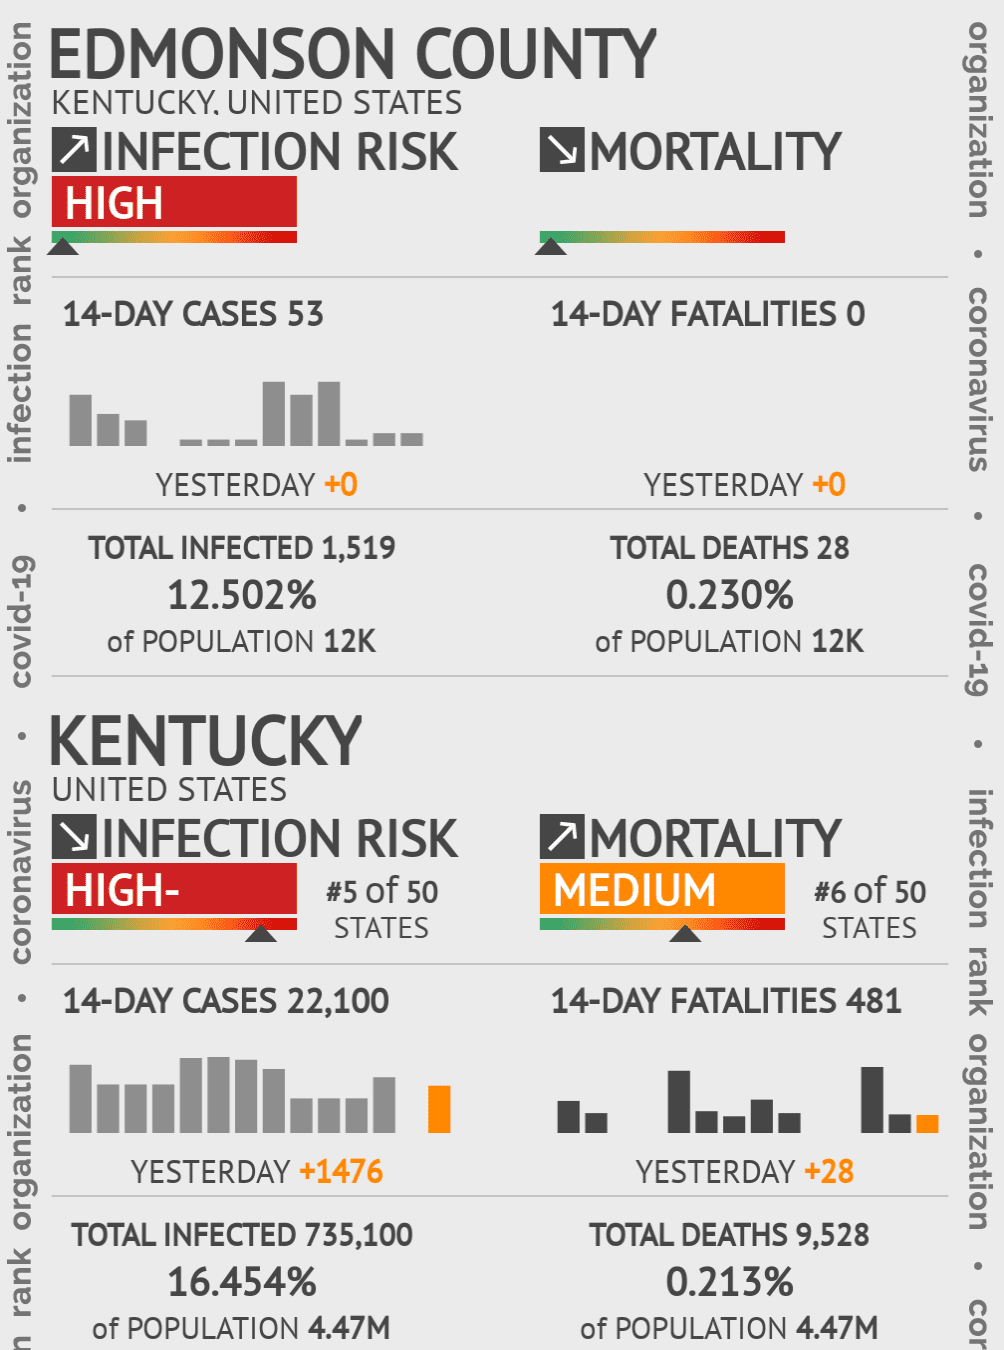 Edmonson County Coronavirus Covid-19 Risk of Infection on July 24, 2021